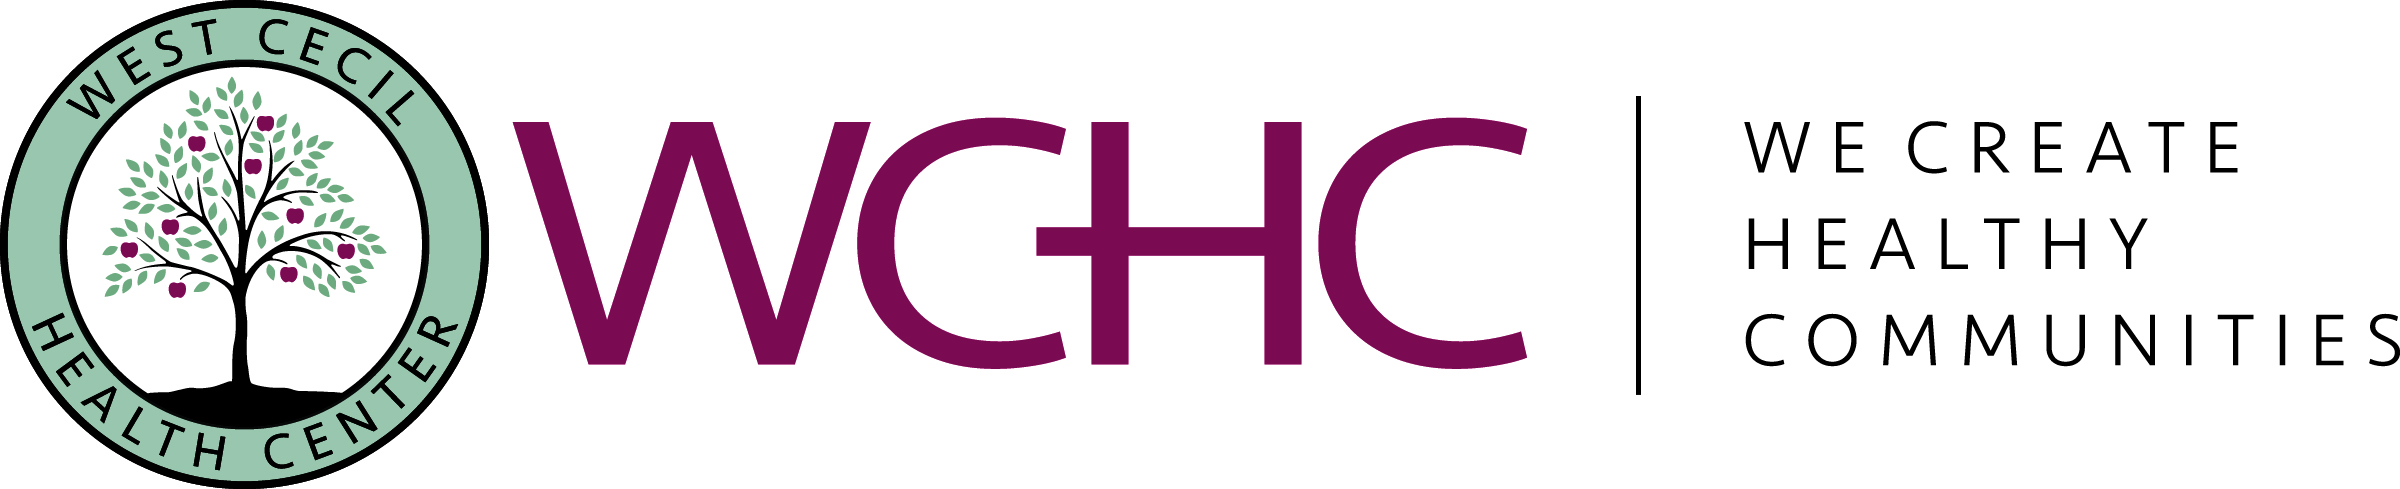 WCHC_color-logo_horizontal_MASTER-5